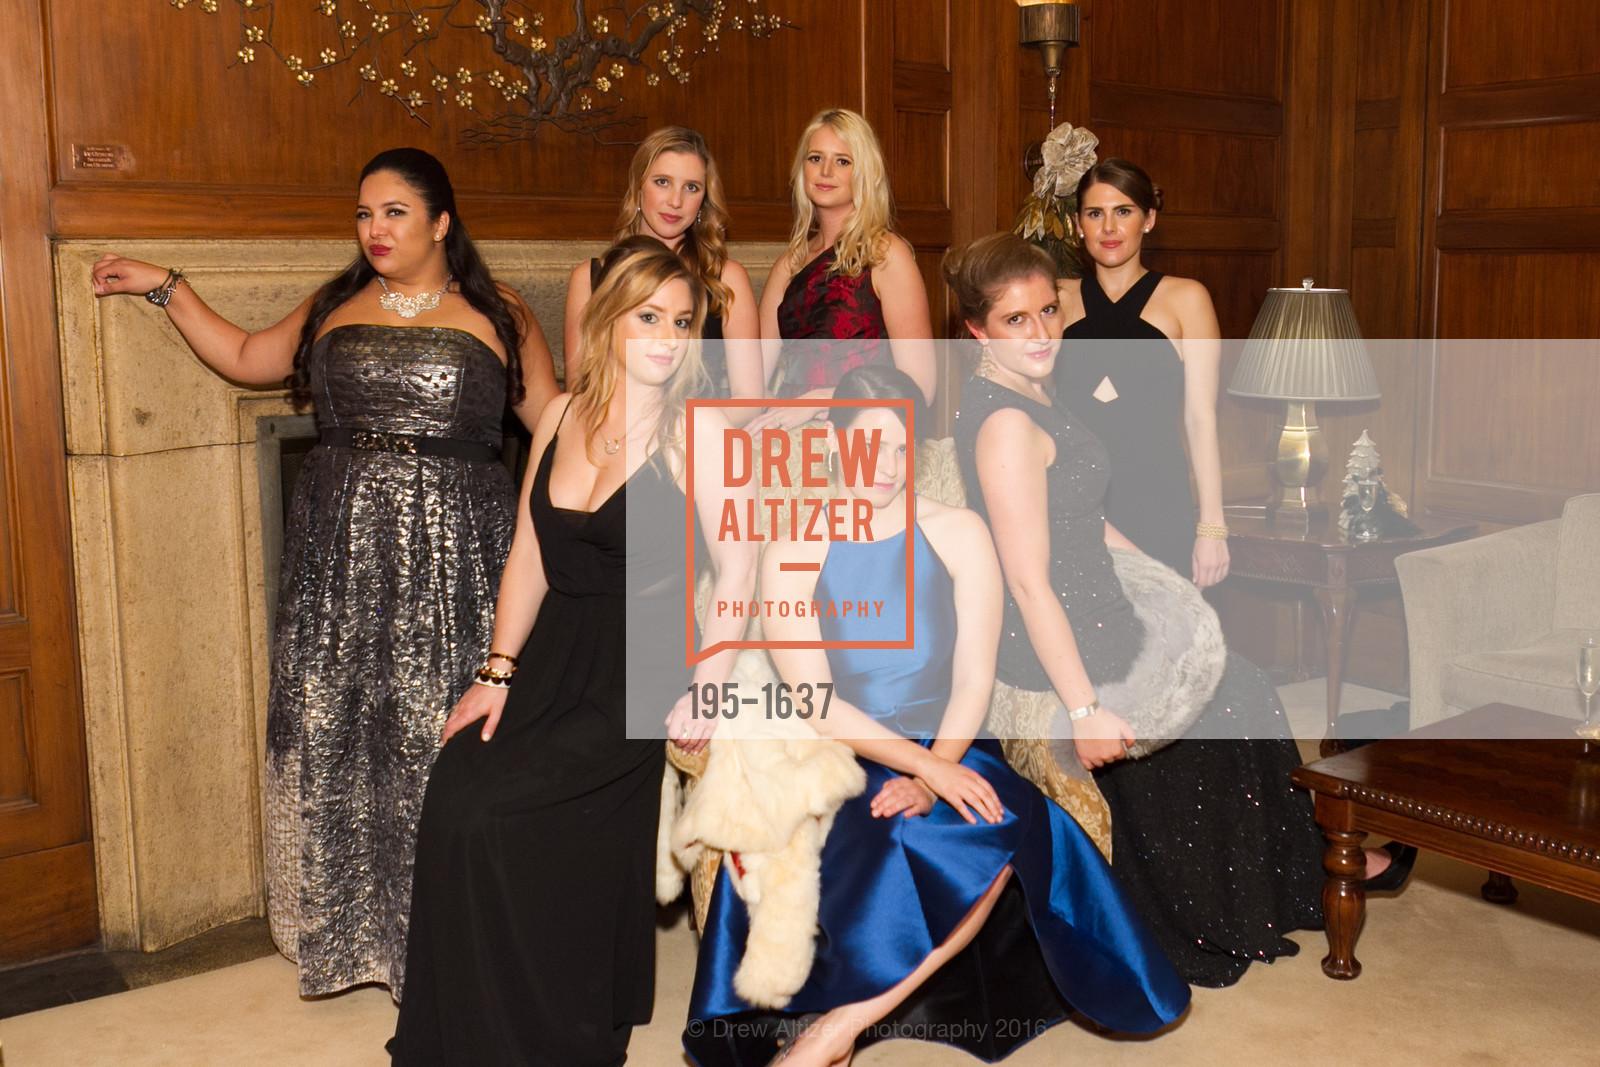 Deyanira Medina, Courtney Costello, Jenn Hazelwood, Laura Moir, Bailey Douglass, Eve Denton, Cailin Todd, Photo #195-1637